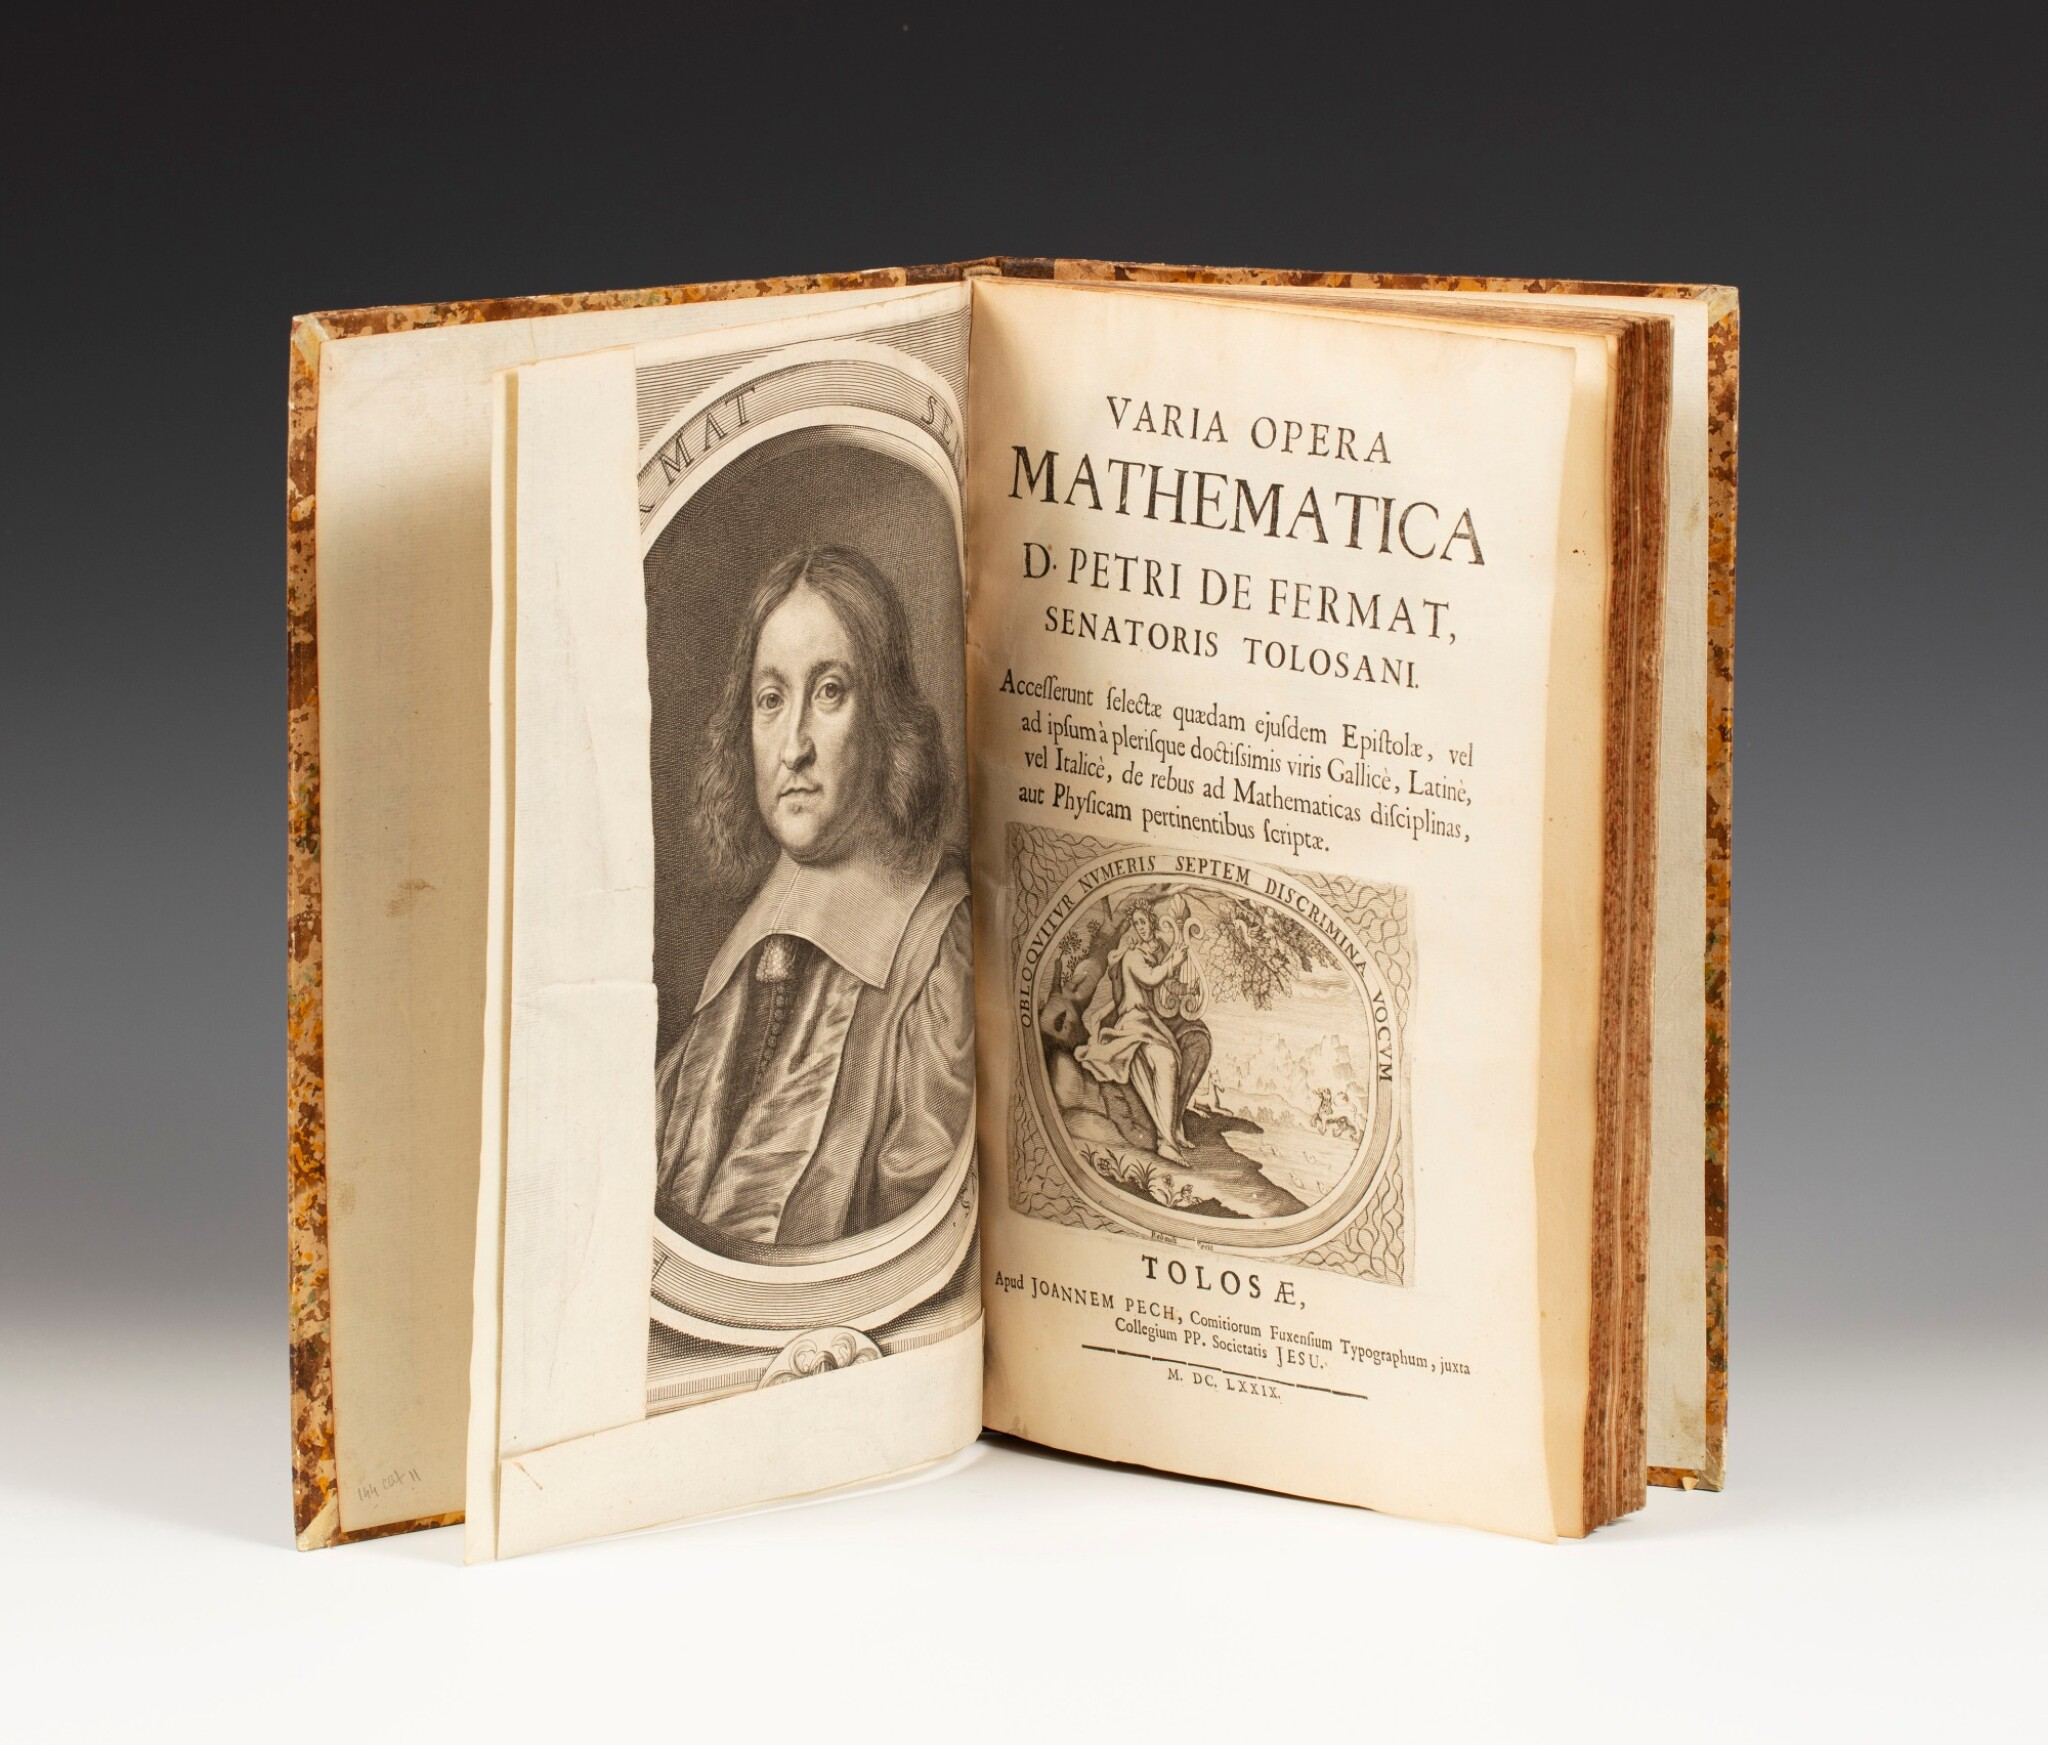 View full screen - View 1 of Lot 104. Varia opera mathematica. Toulouse,1679. Petit in-folio. Edition originale. De la bibliothèque de Jacques Lacan..